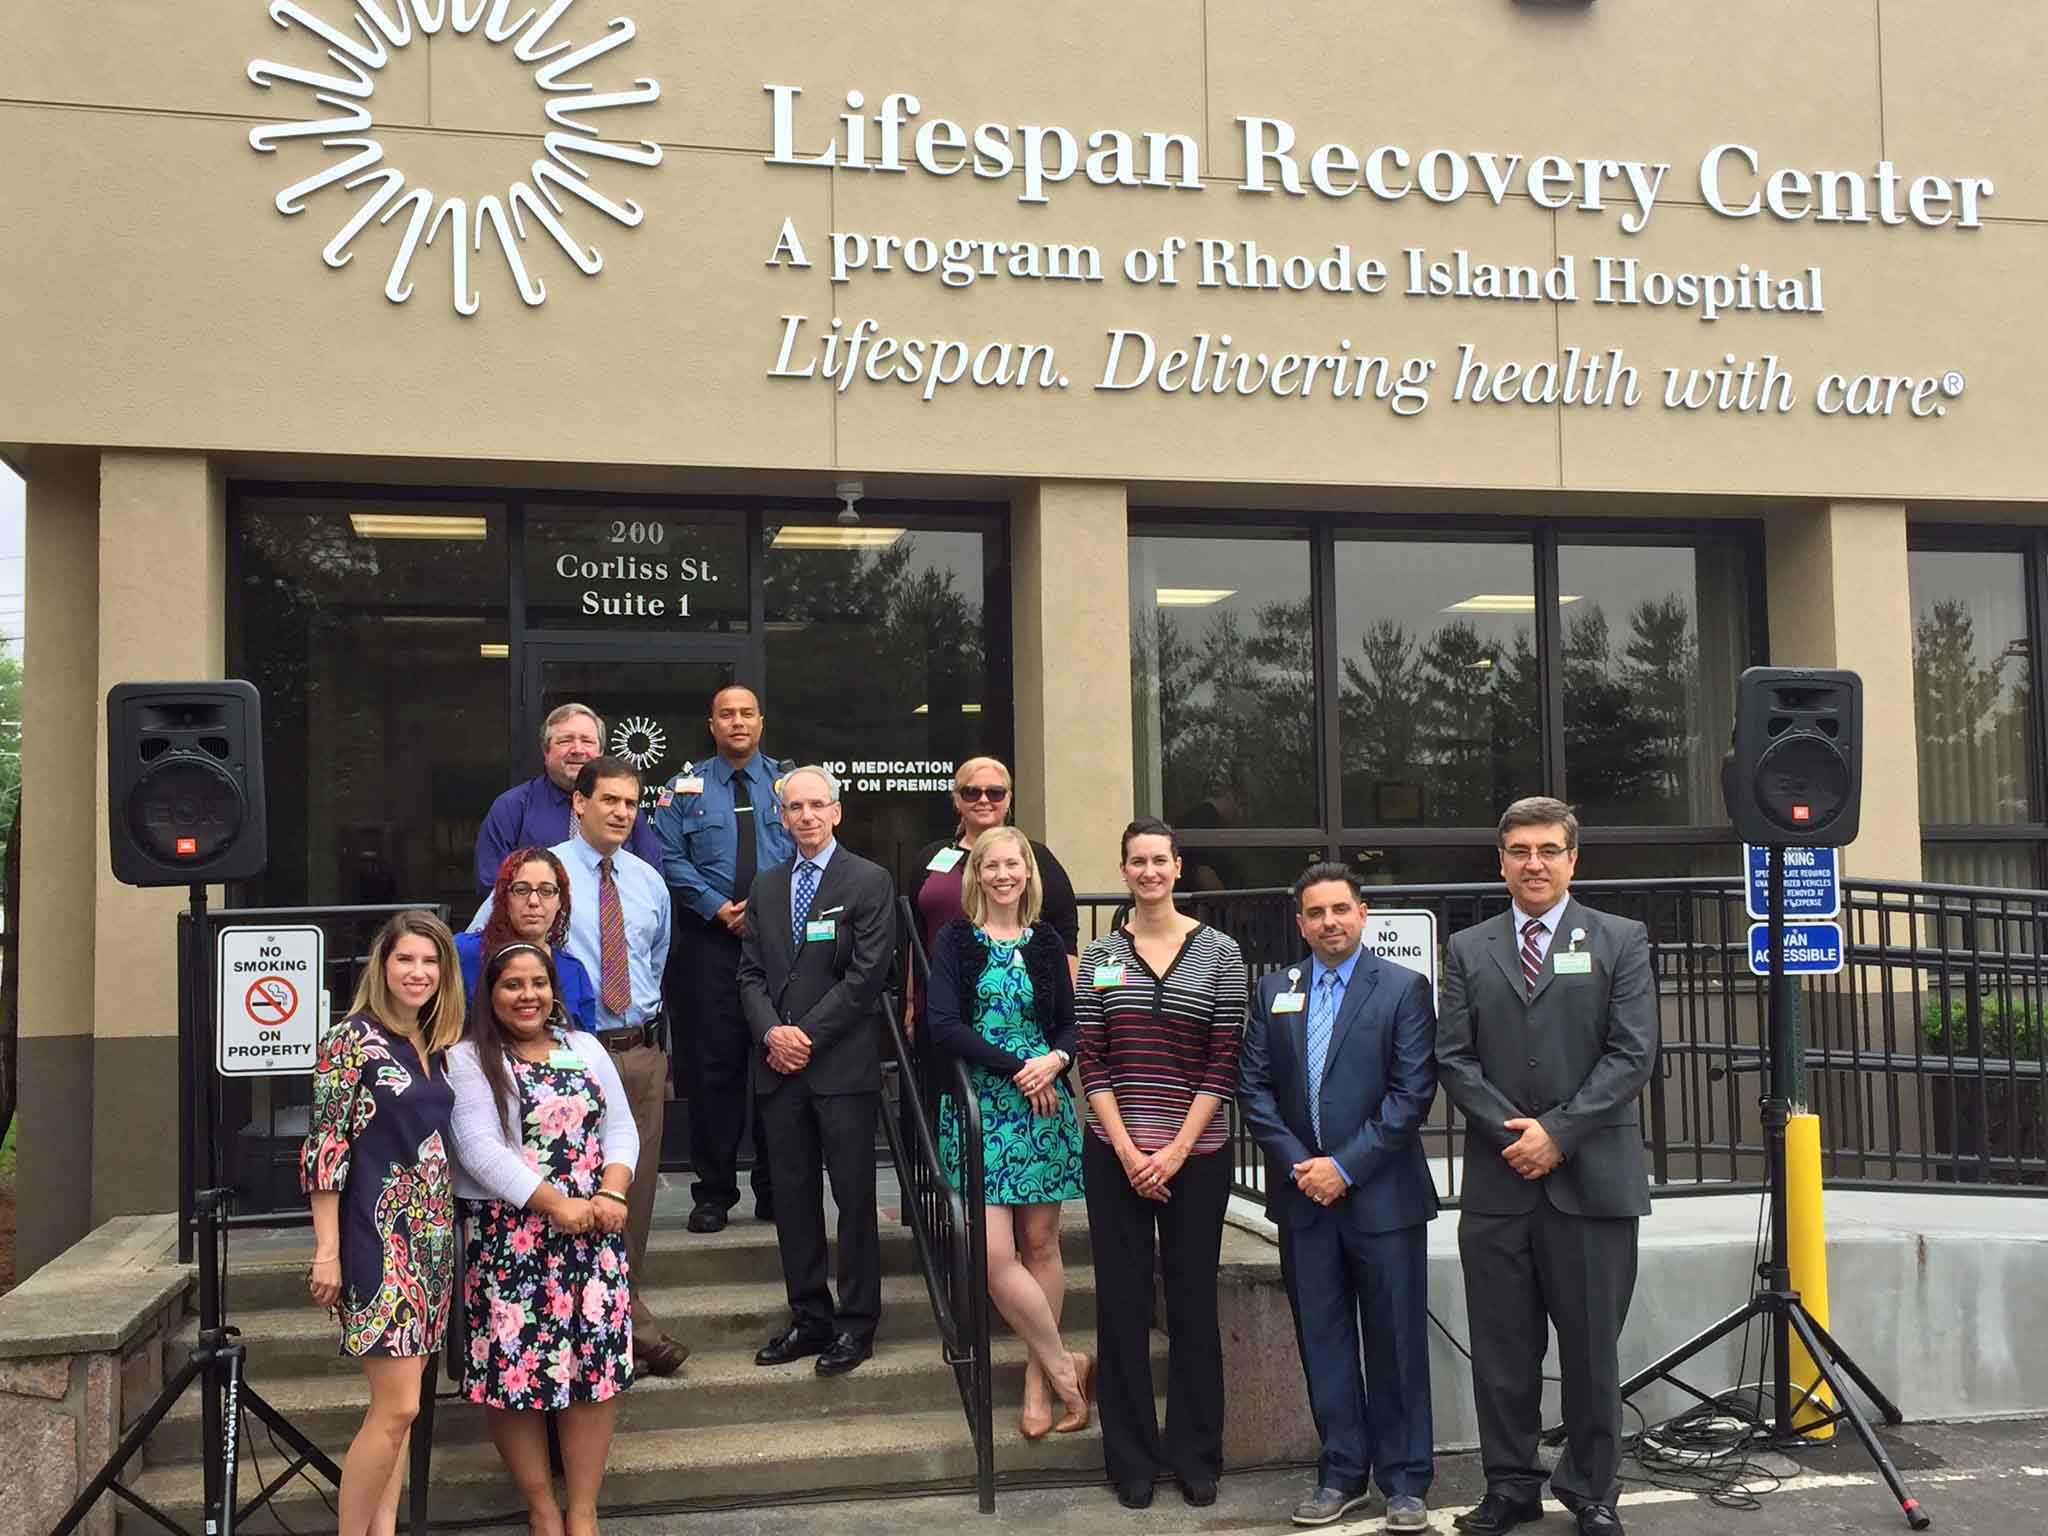 Lifespan recovery center